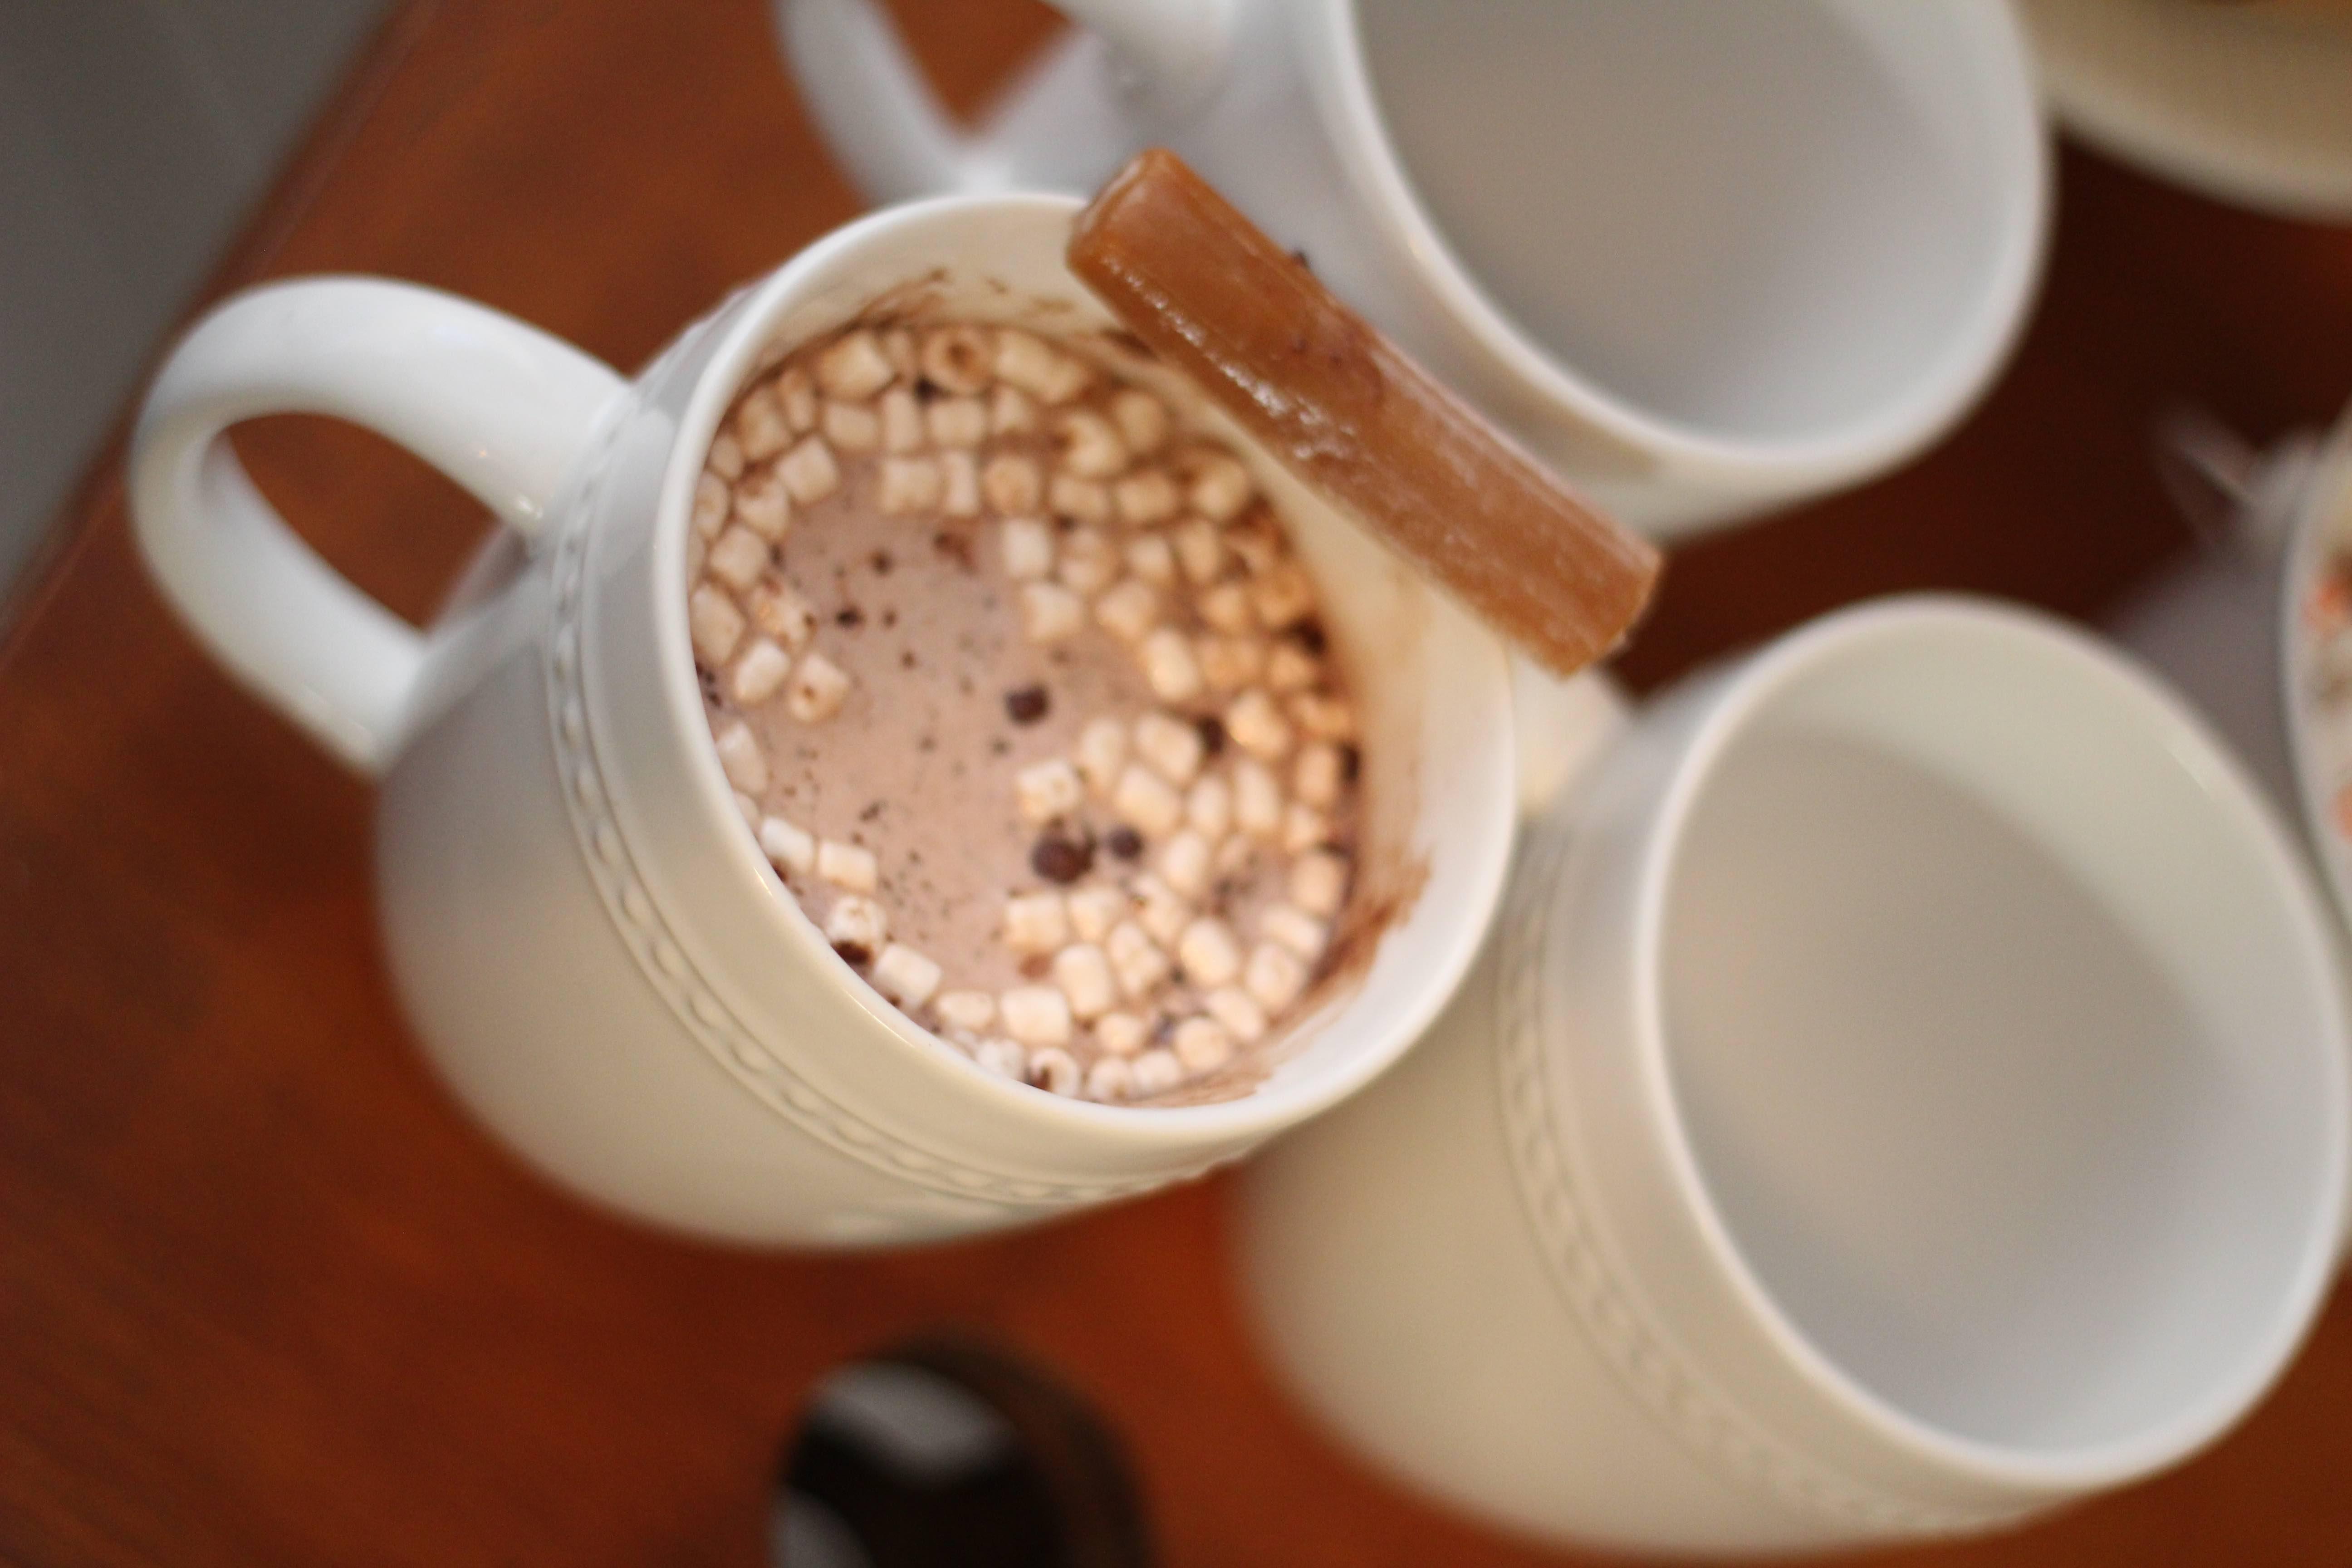 Everyday Party Magazine Caramel Cream Hot Cocoa